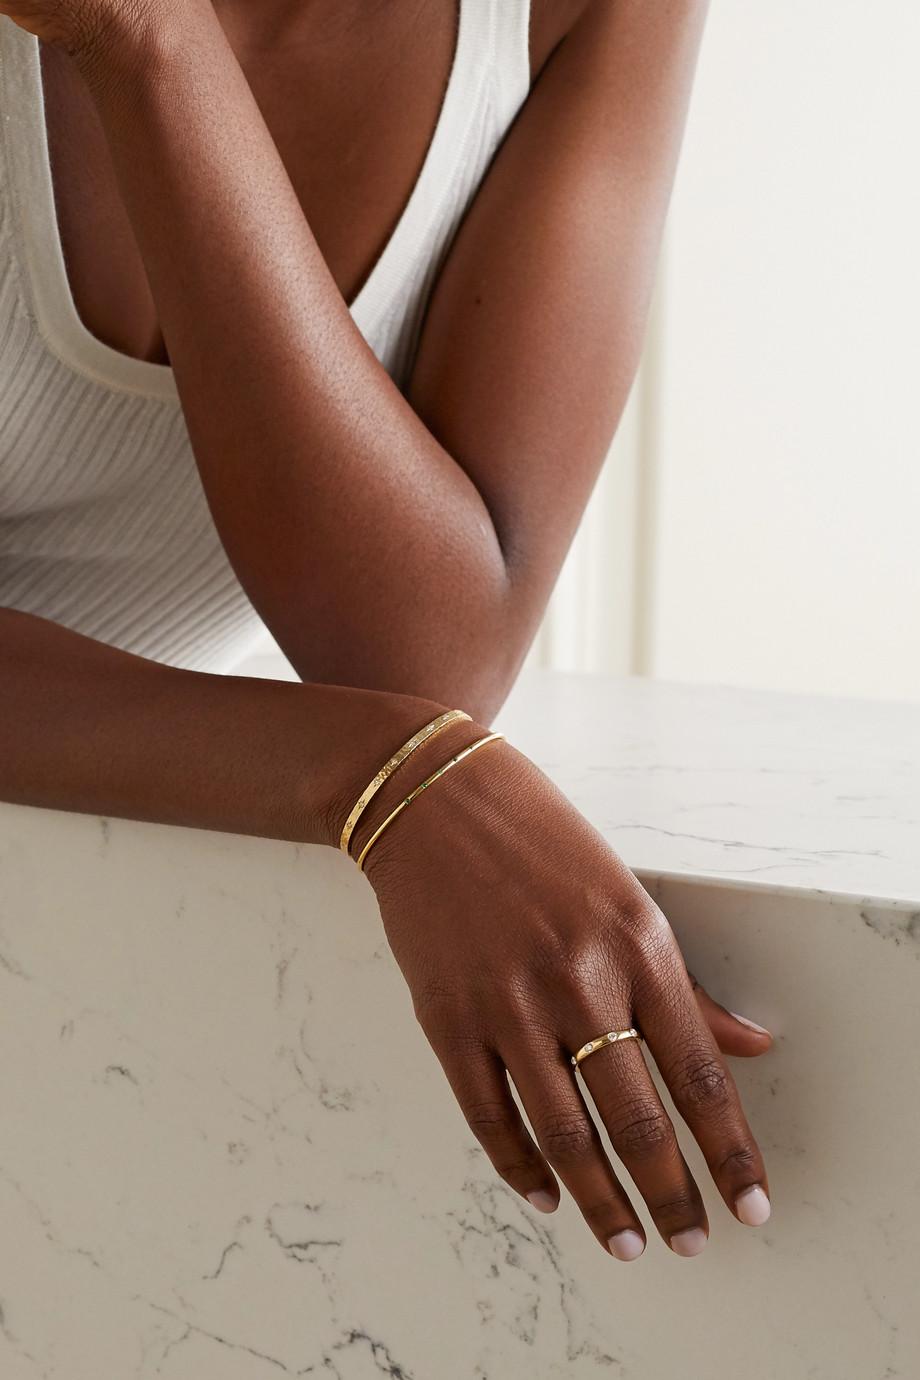 Octavia Elizabeth + NET SUSTAIN Nesting Gem 18-karat gold emerald cuff